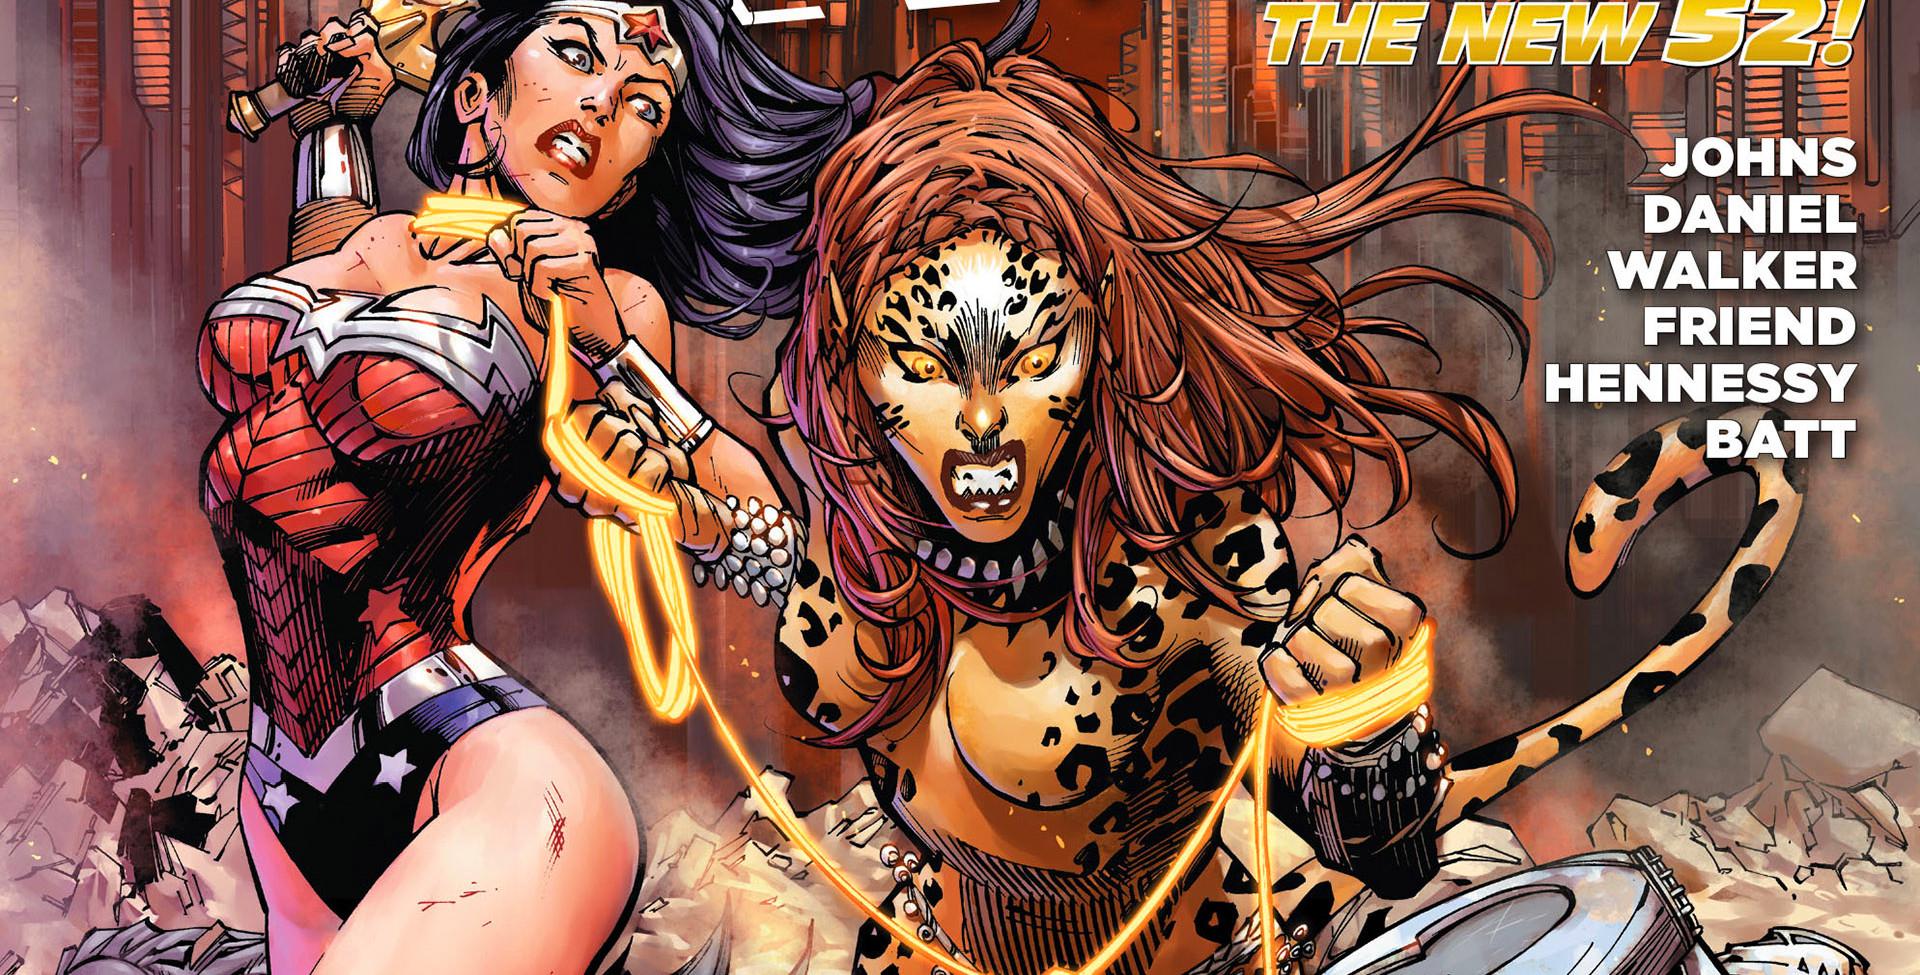 Wonder Woman 2'nin Kötüsü Belli Oldu